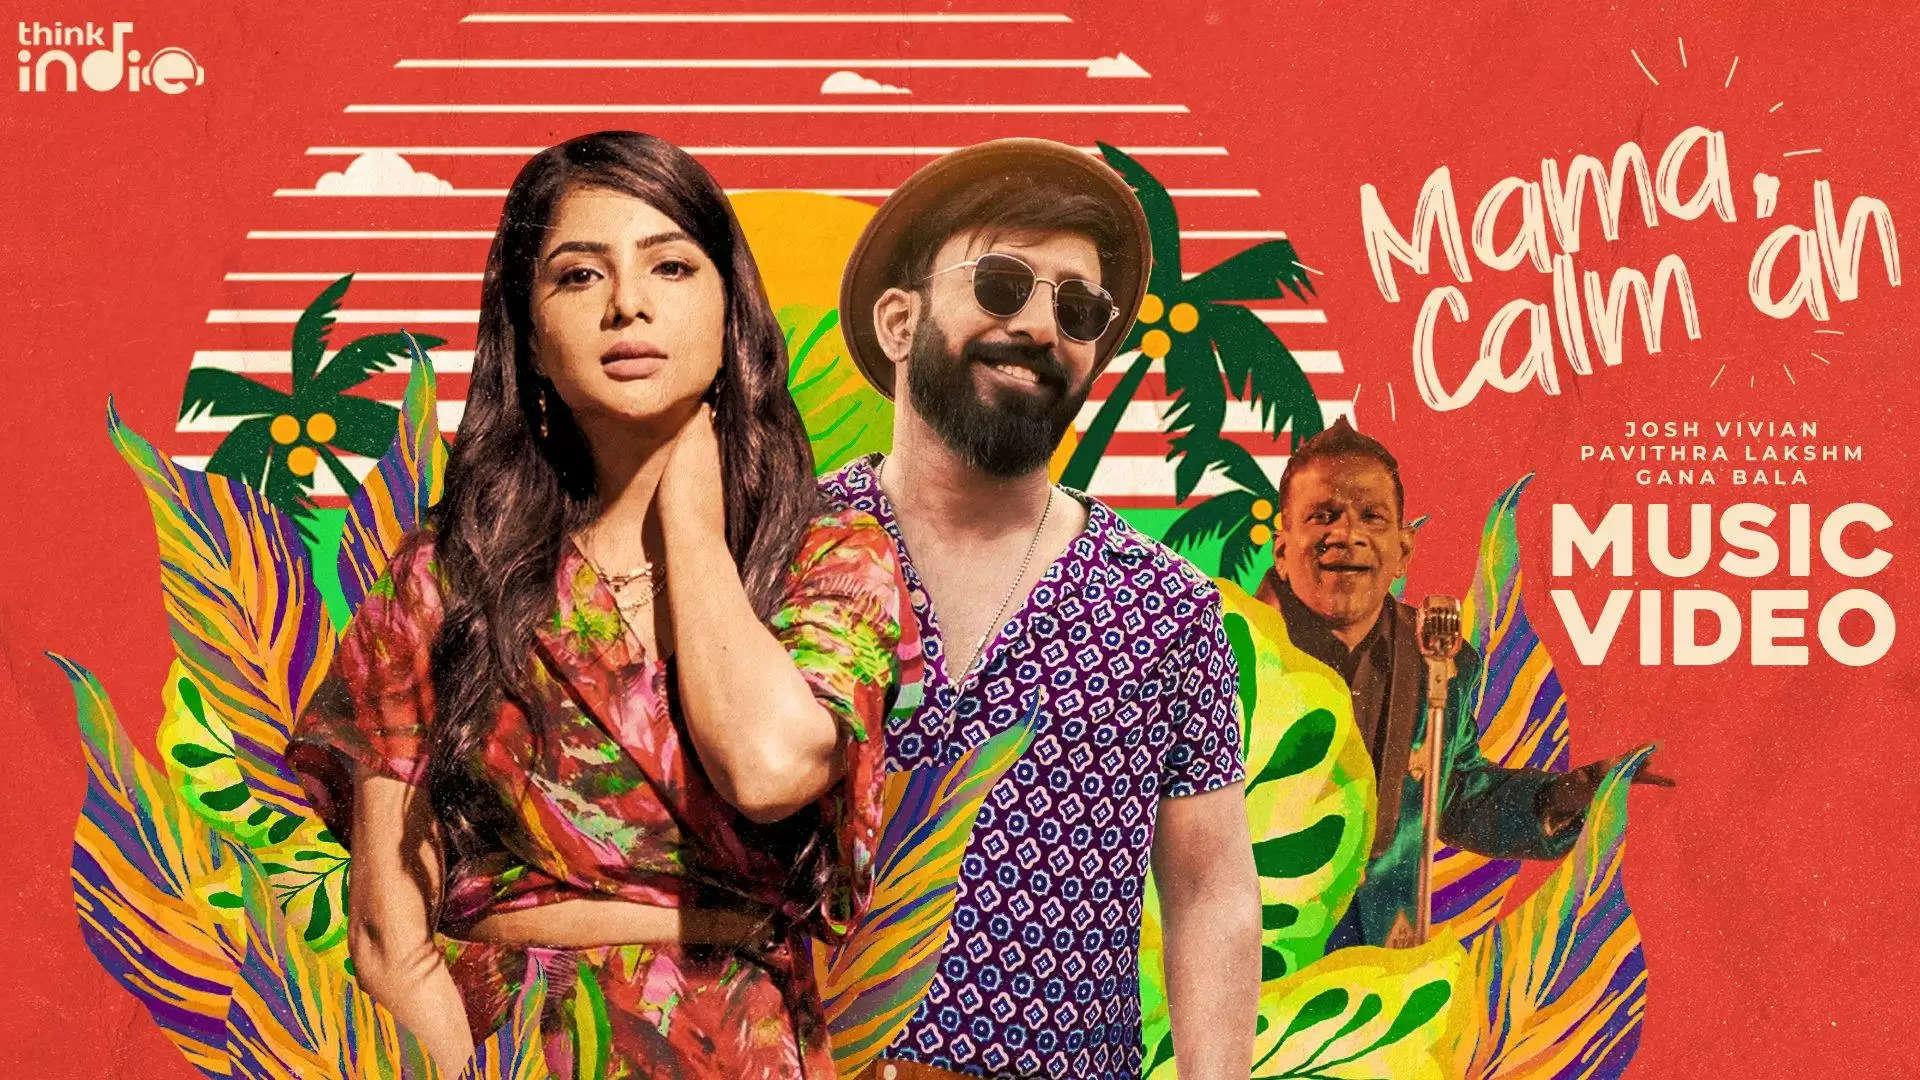 Josh Vivian – Mama Calm Ah (feat. Gana Bala) | Pavithra Lakshmi | Think Indie | Official Music Video